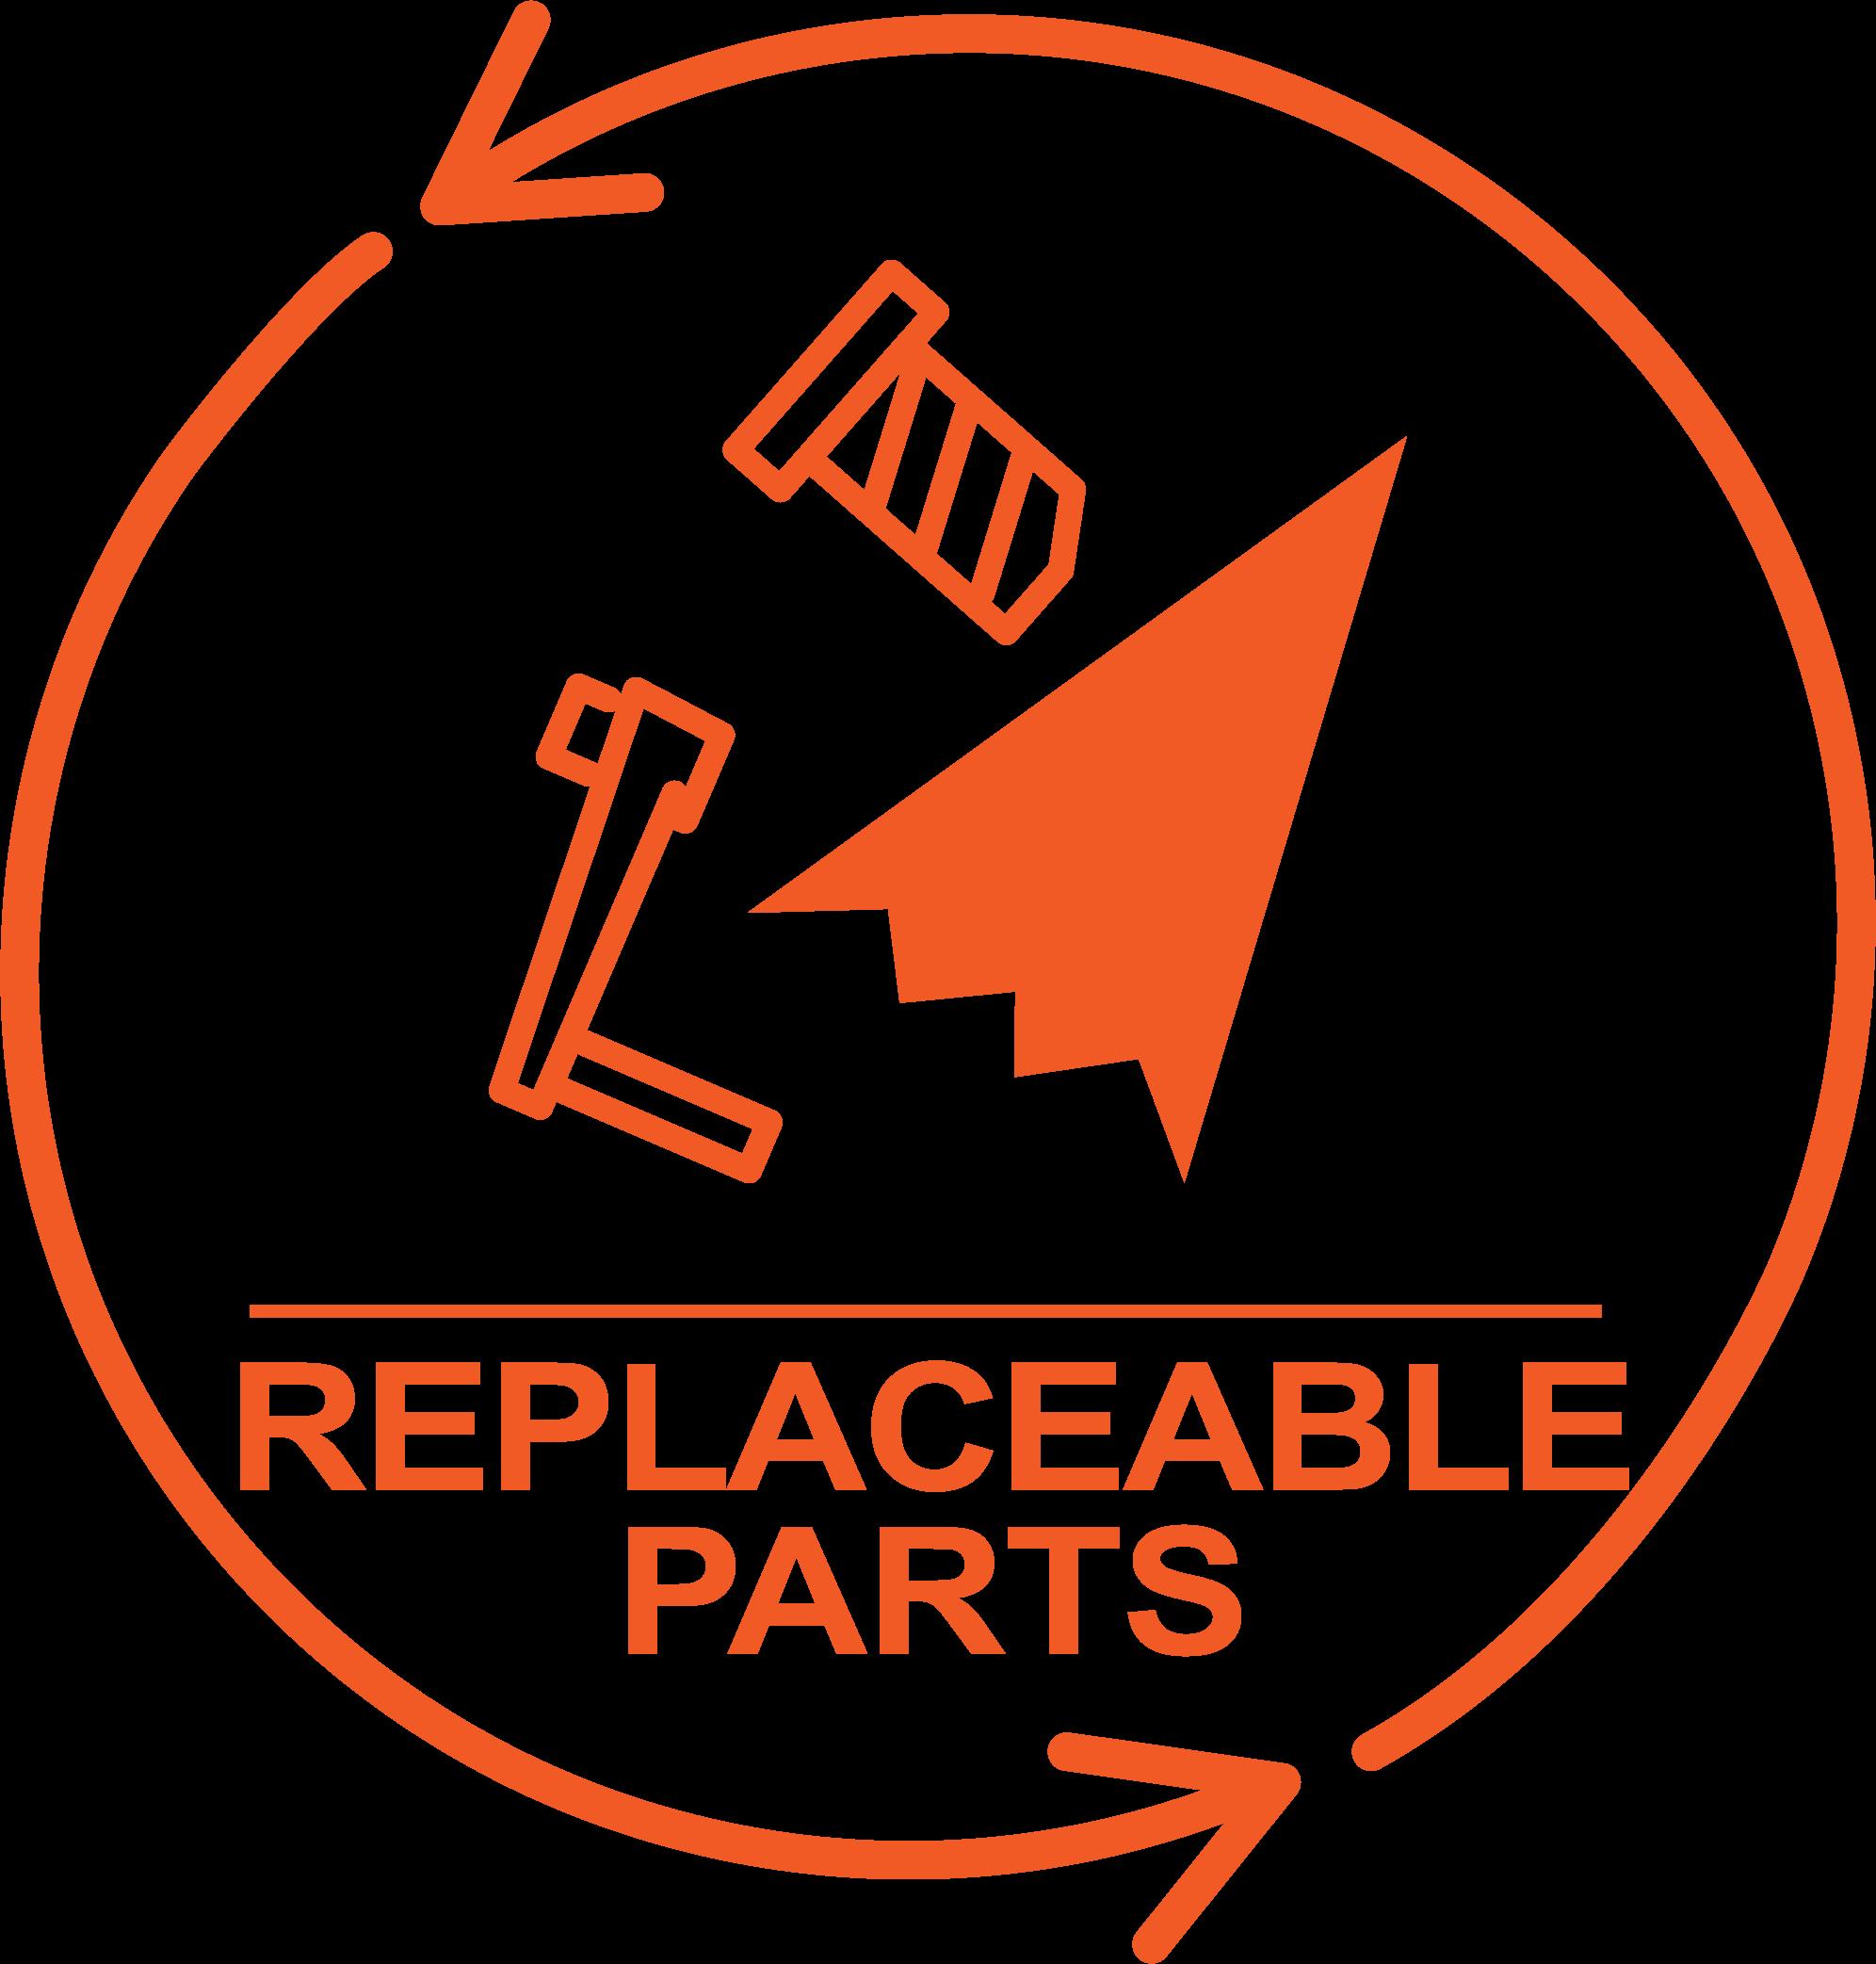 replaceable parts.png